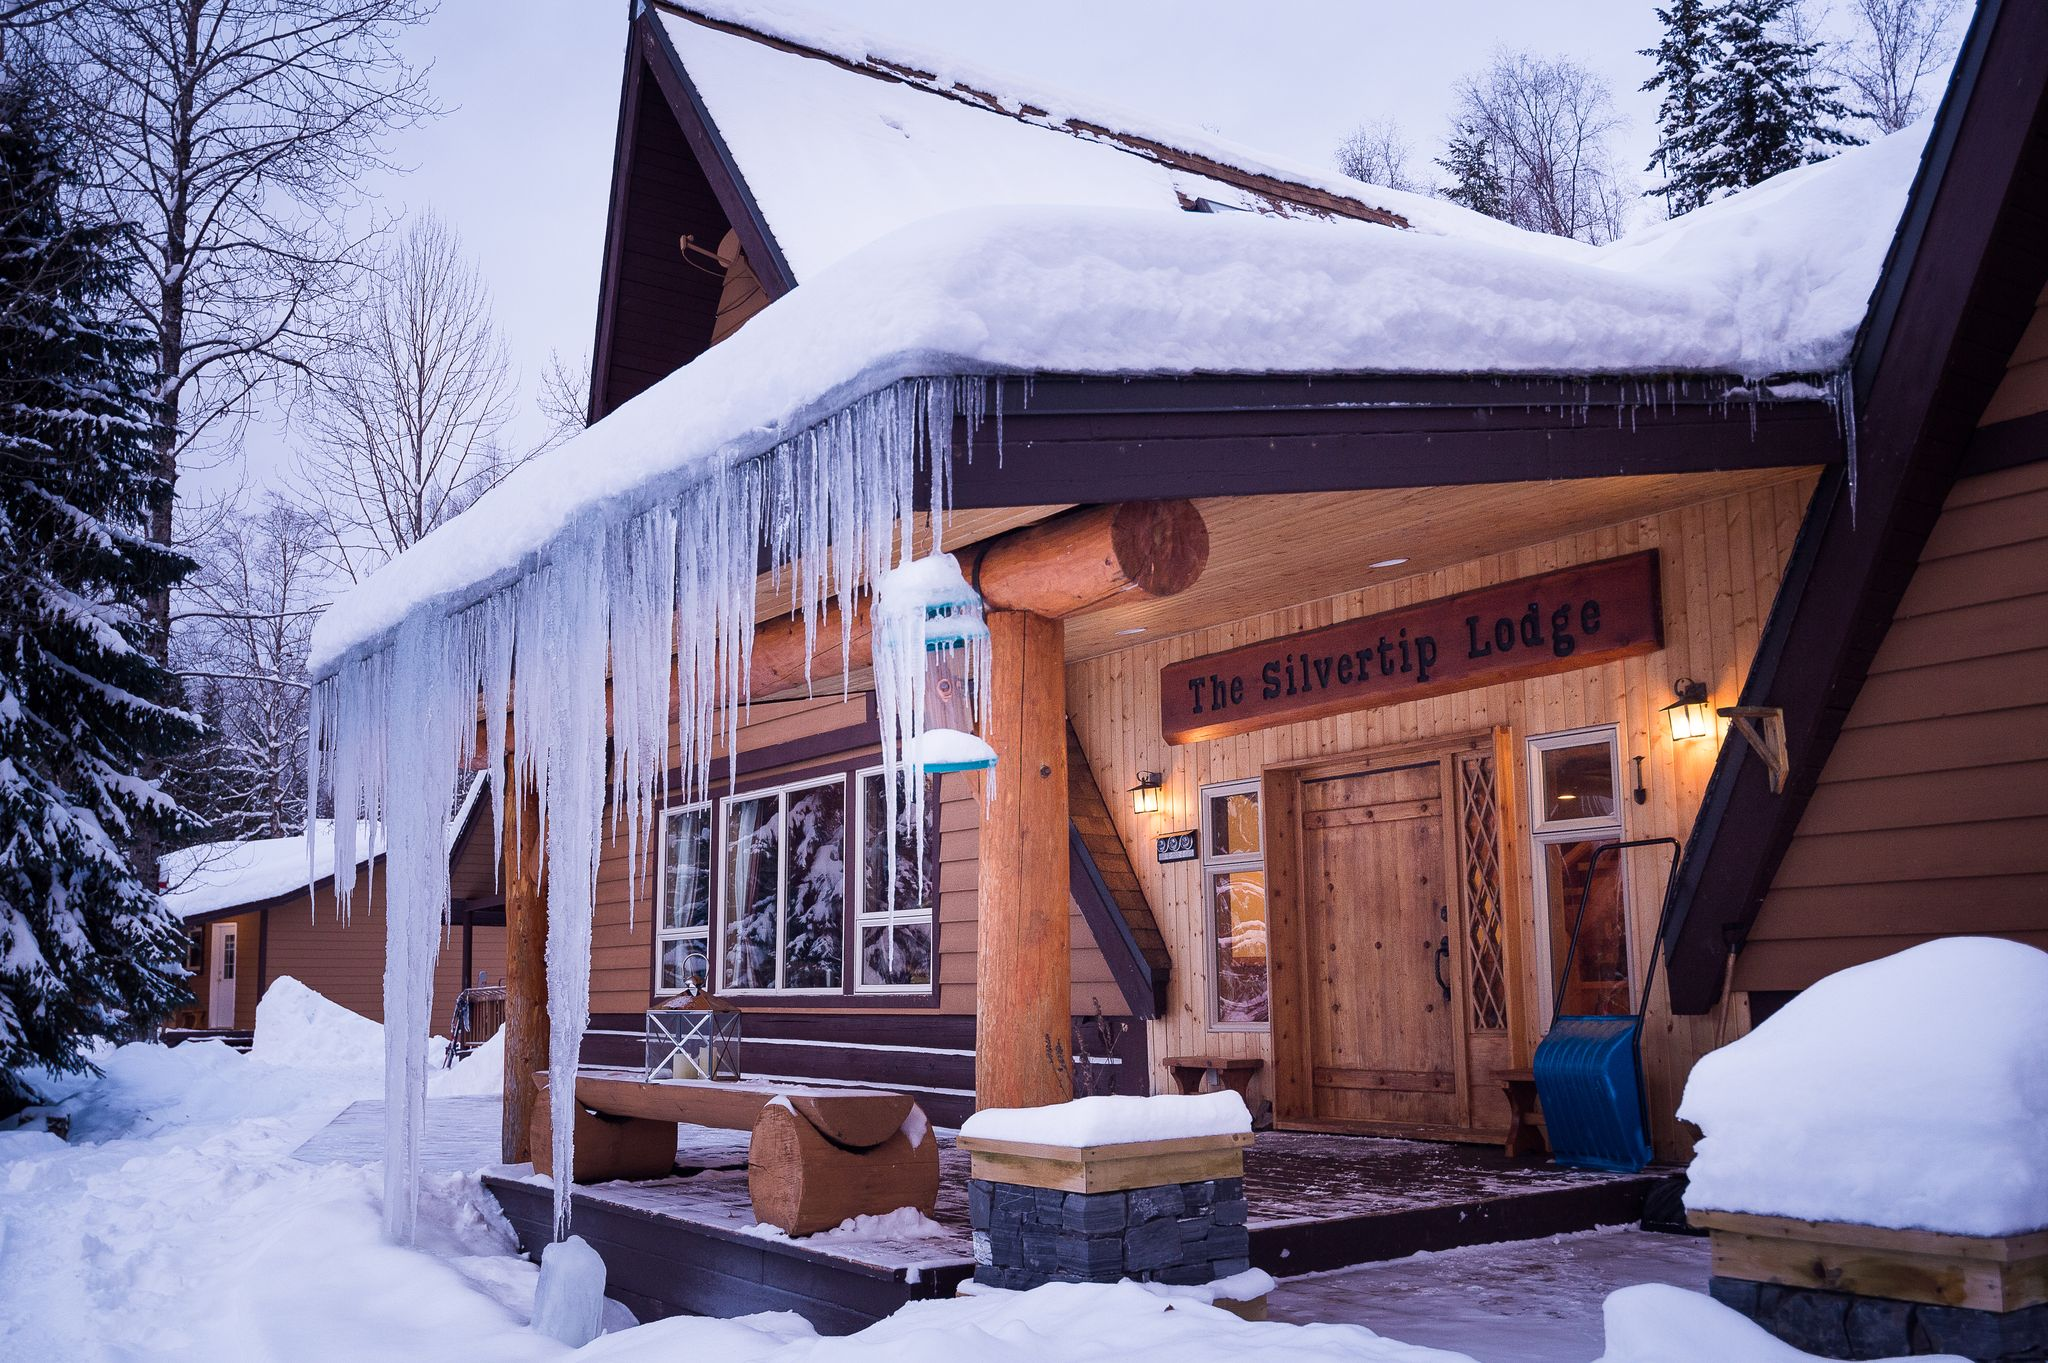 Silvertip lodge